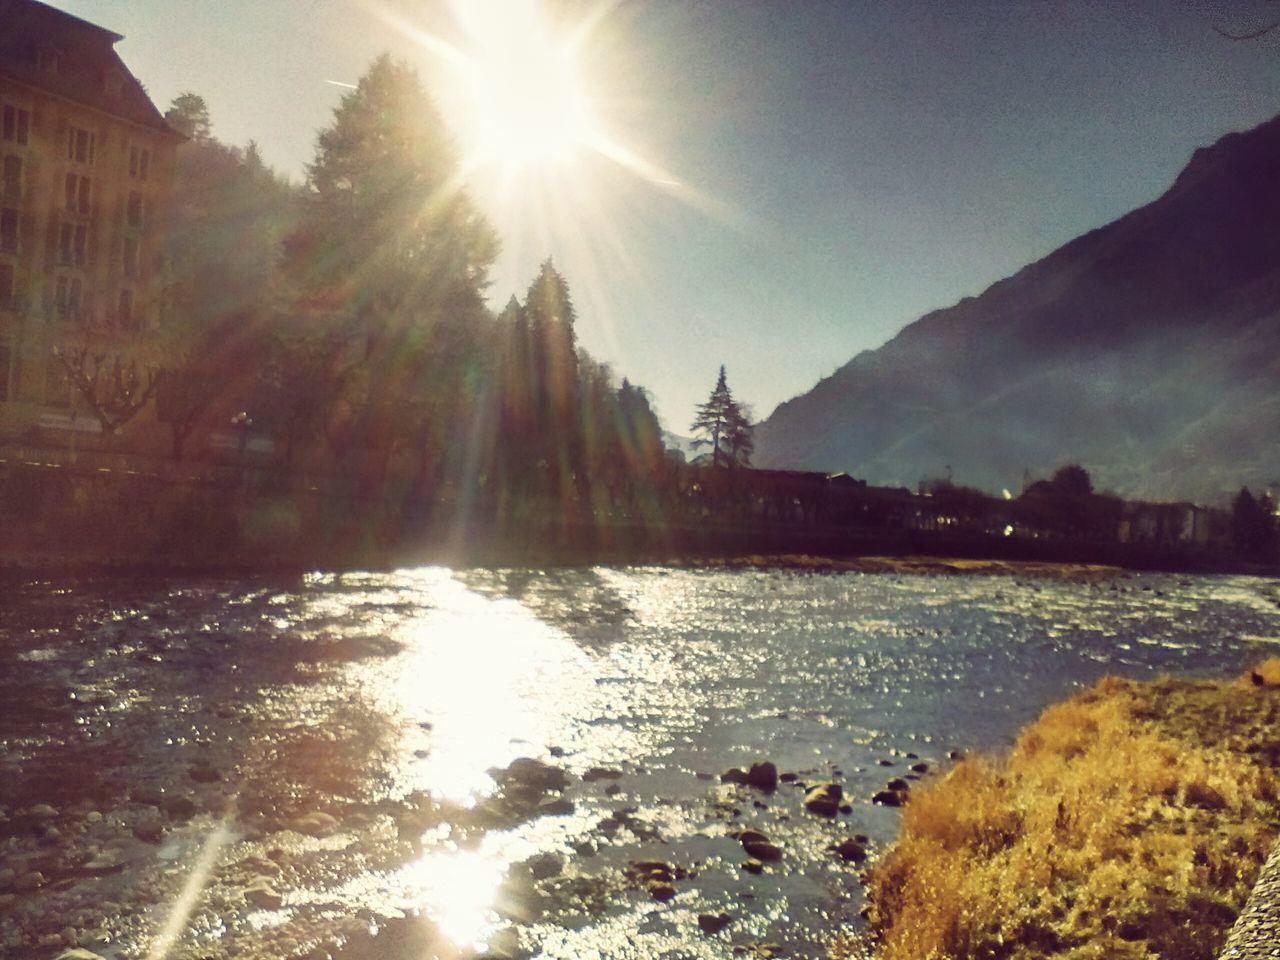 Fiume Valle Brembana San Pellegrino Terme Weekend Italy🇮🇹